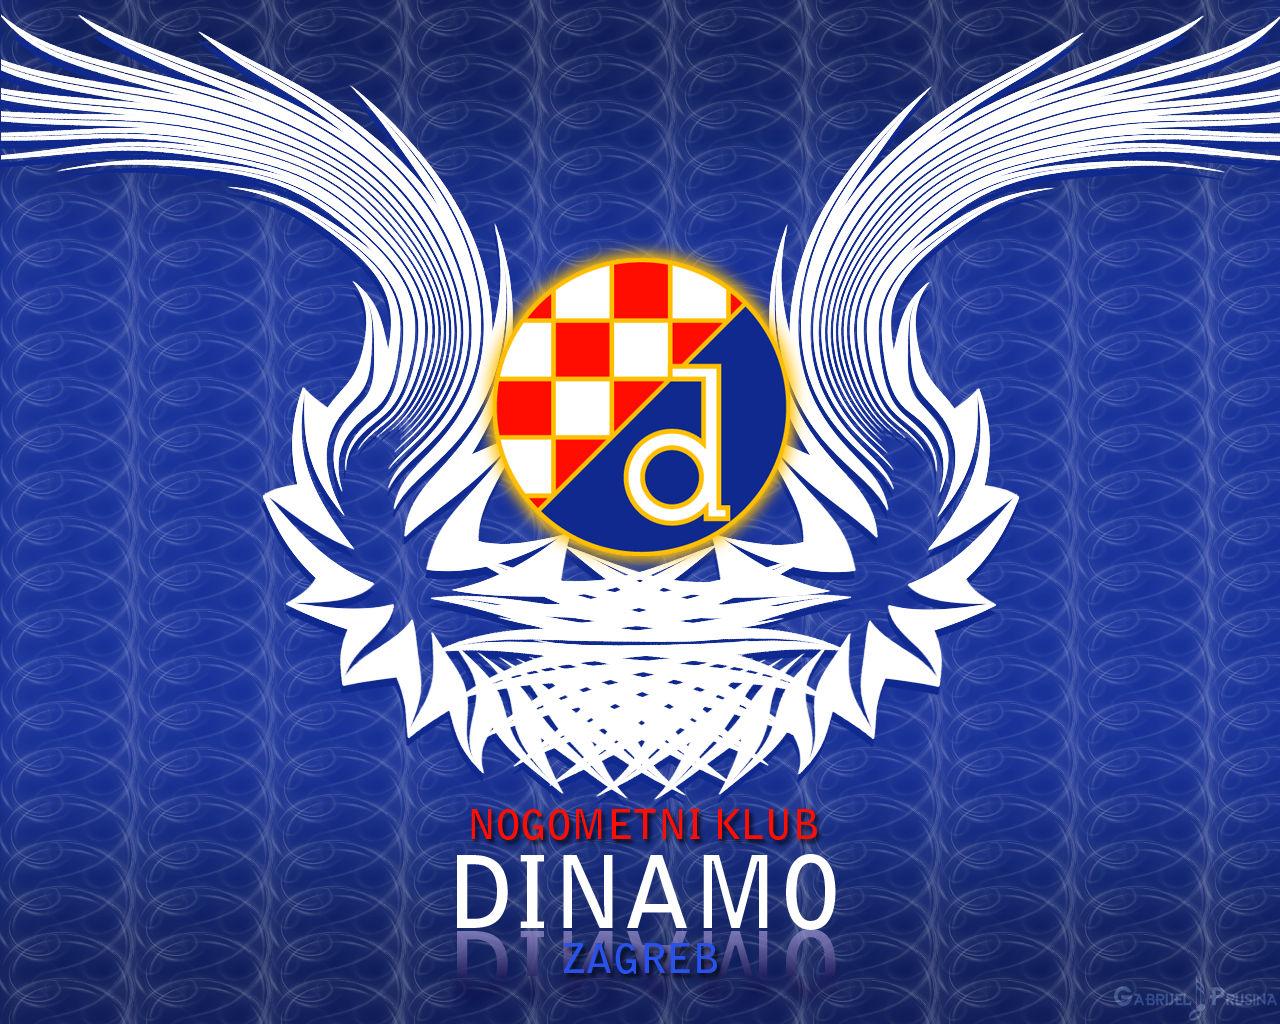 Dinamo Zagreb soccer team T-shirt art by payuta on DeviantArt  |Dinamo Zagreb